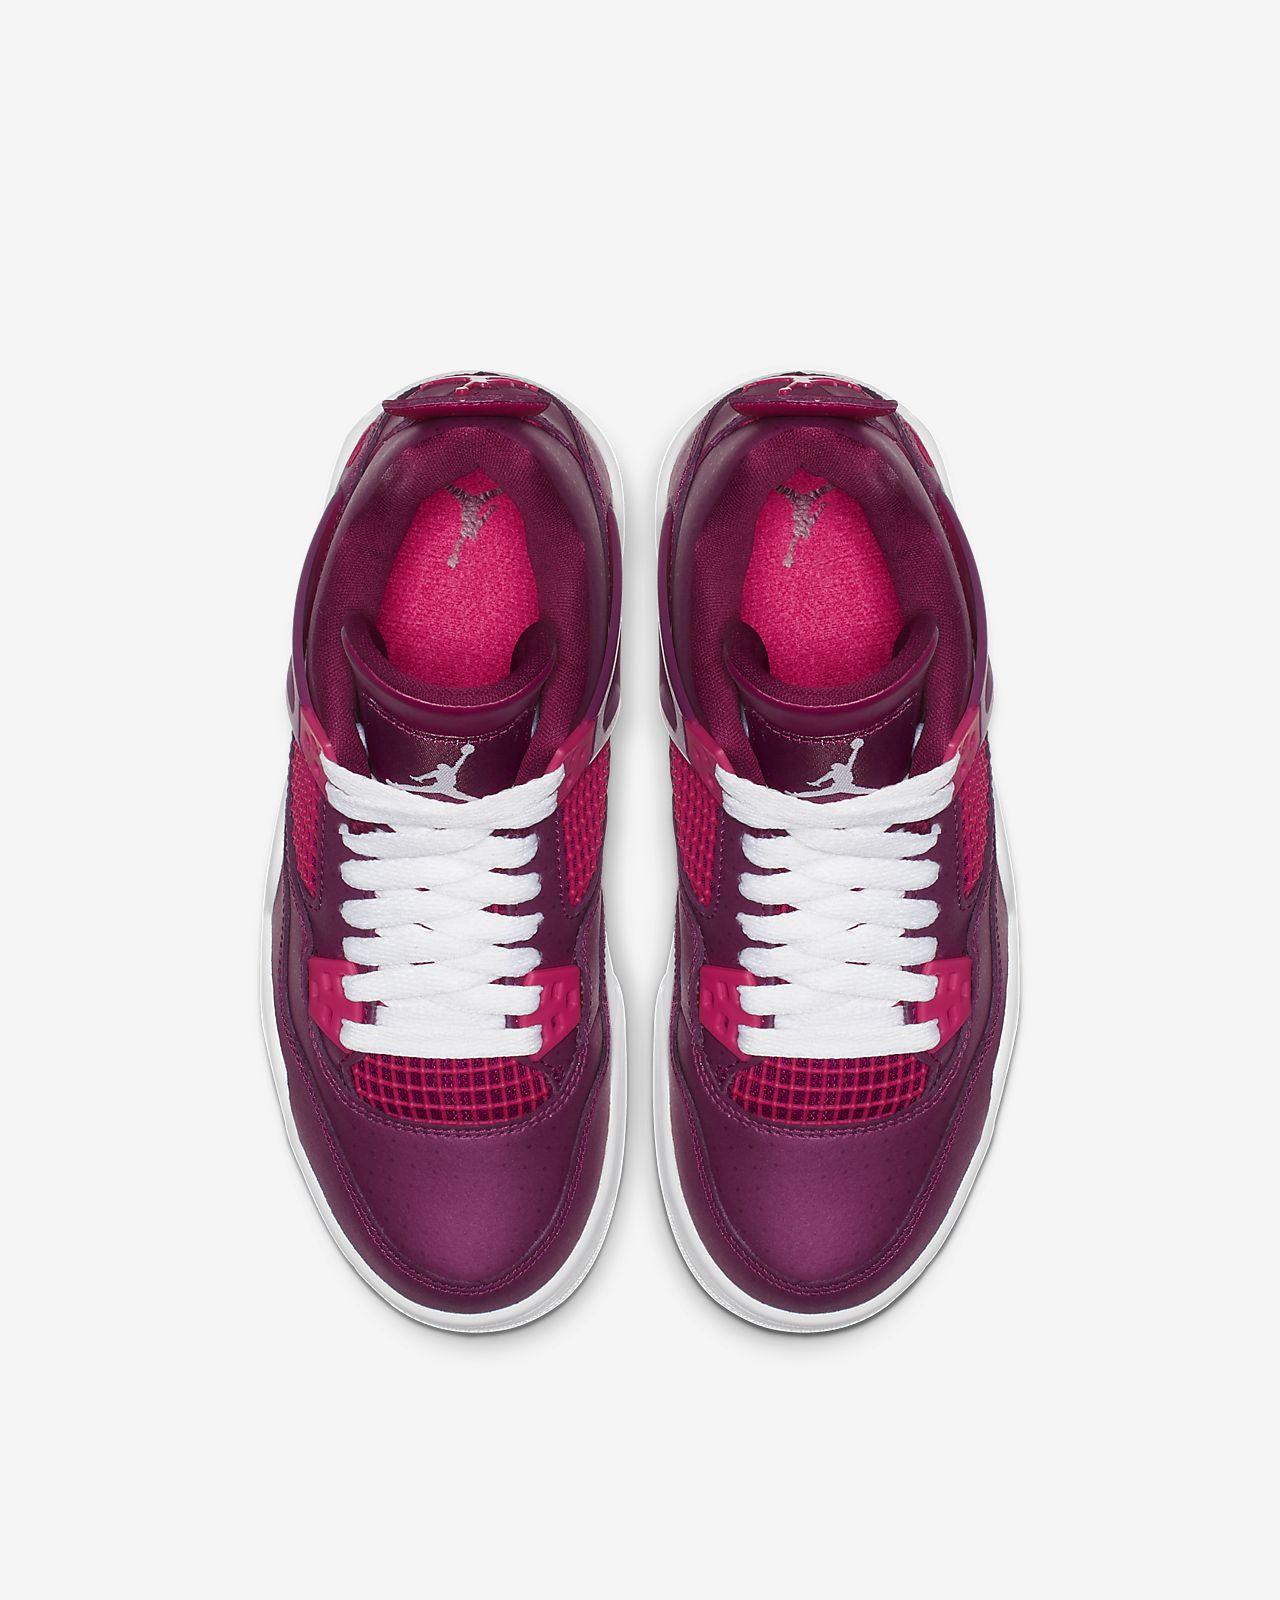 835014fd109fbe Air Jordan 4 Retro Big Kids  Shoe. Nike.com